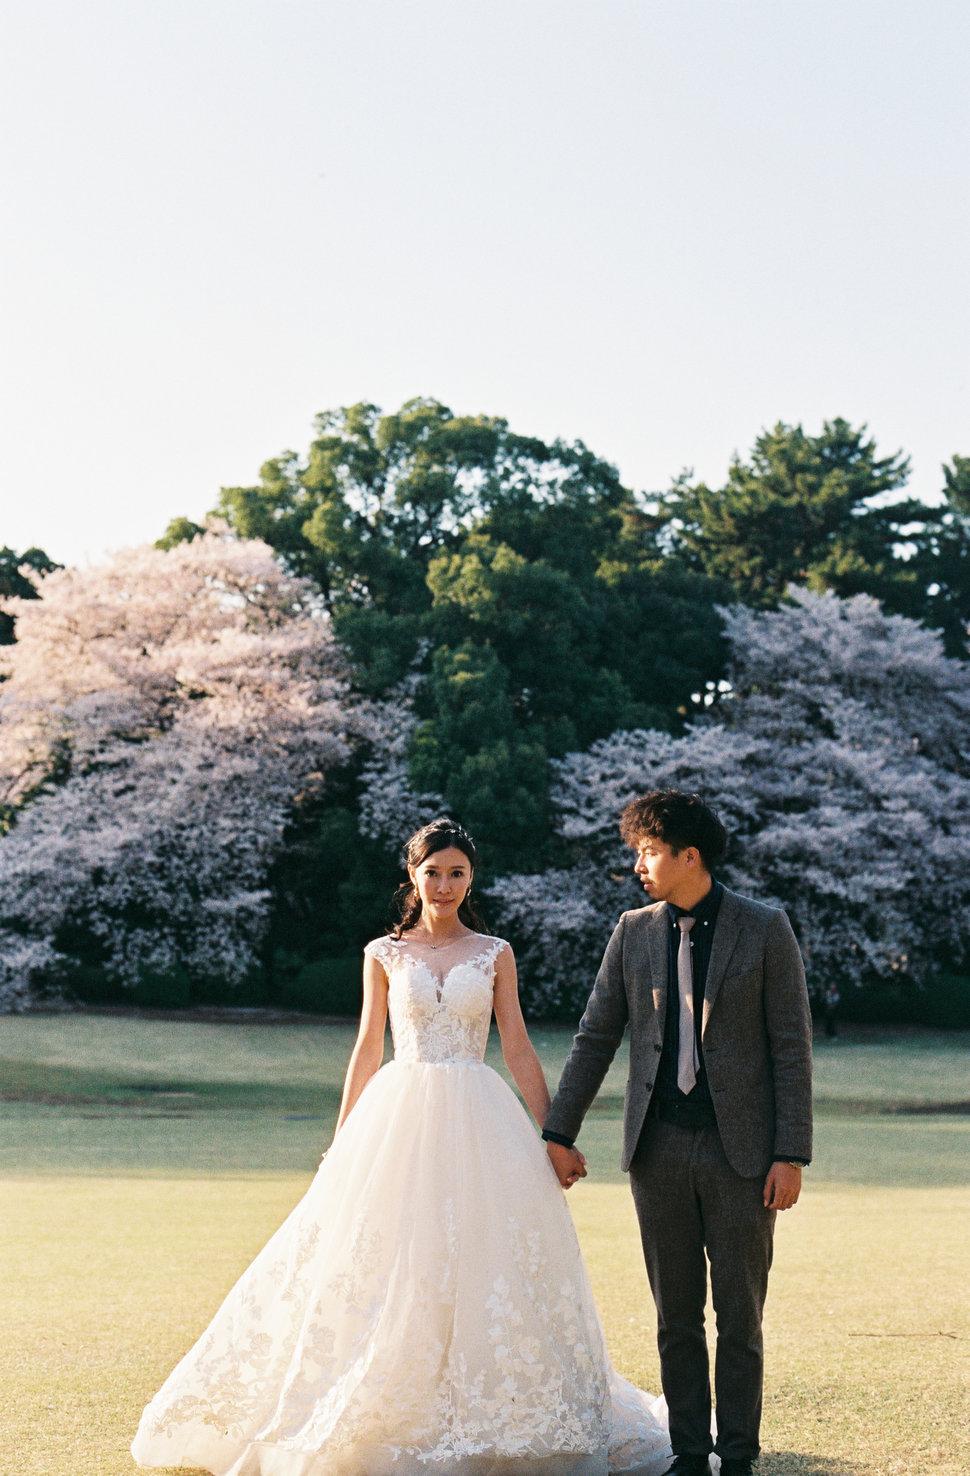 CNV000024 (1) - All Good Wedding - 結婚吧